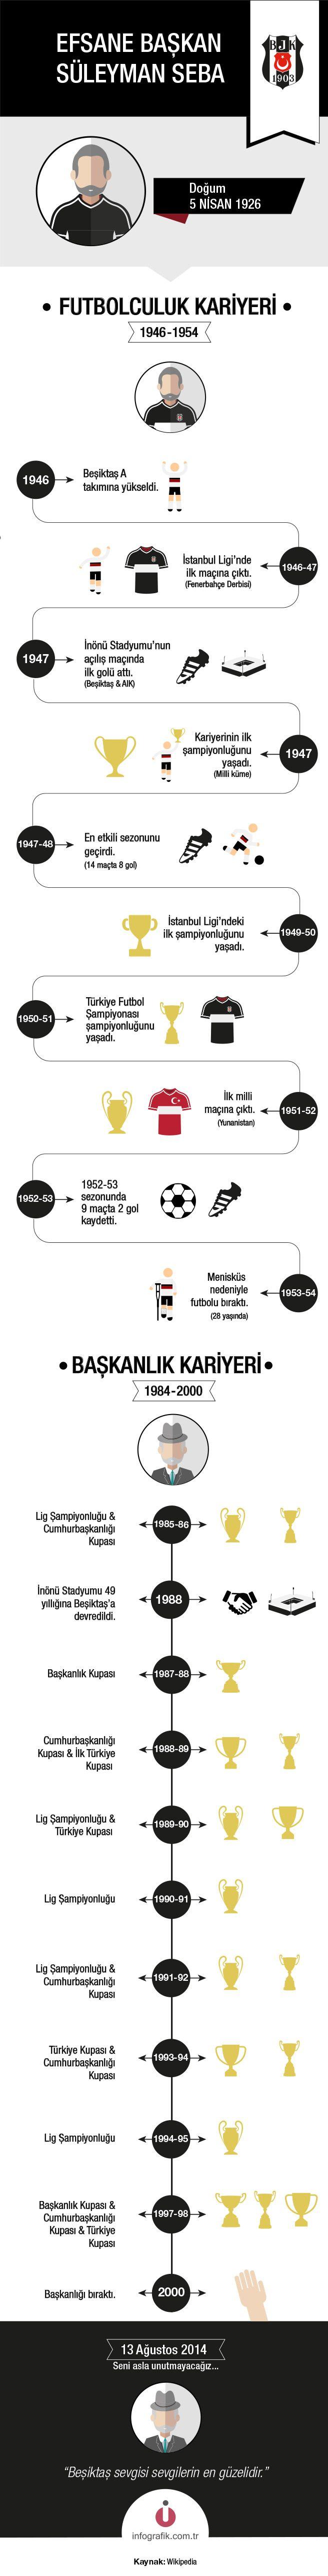 Efsane Başkan: Süleyman Seba